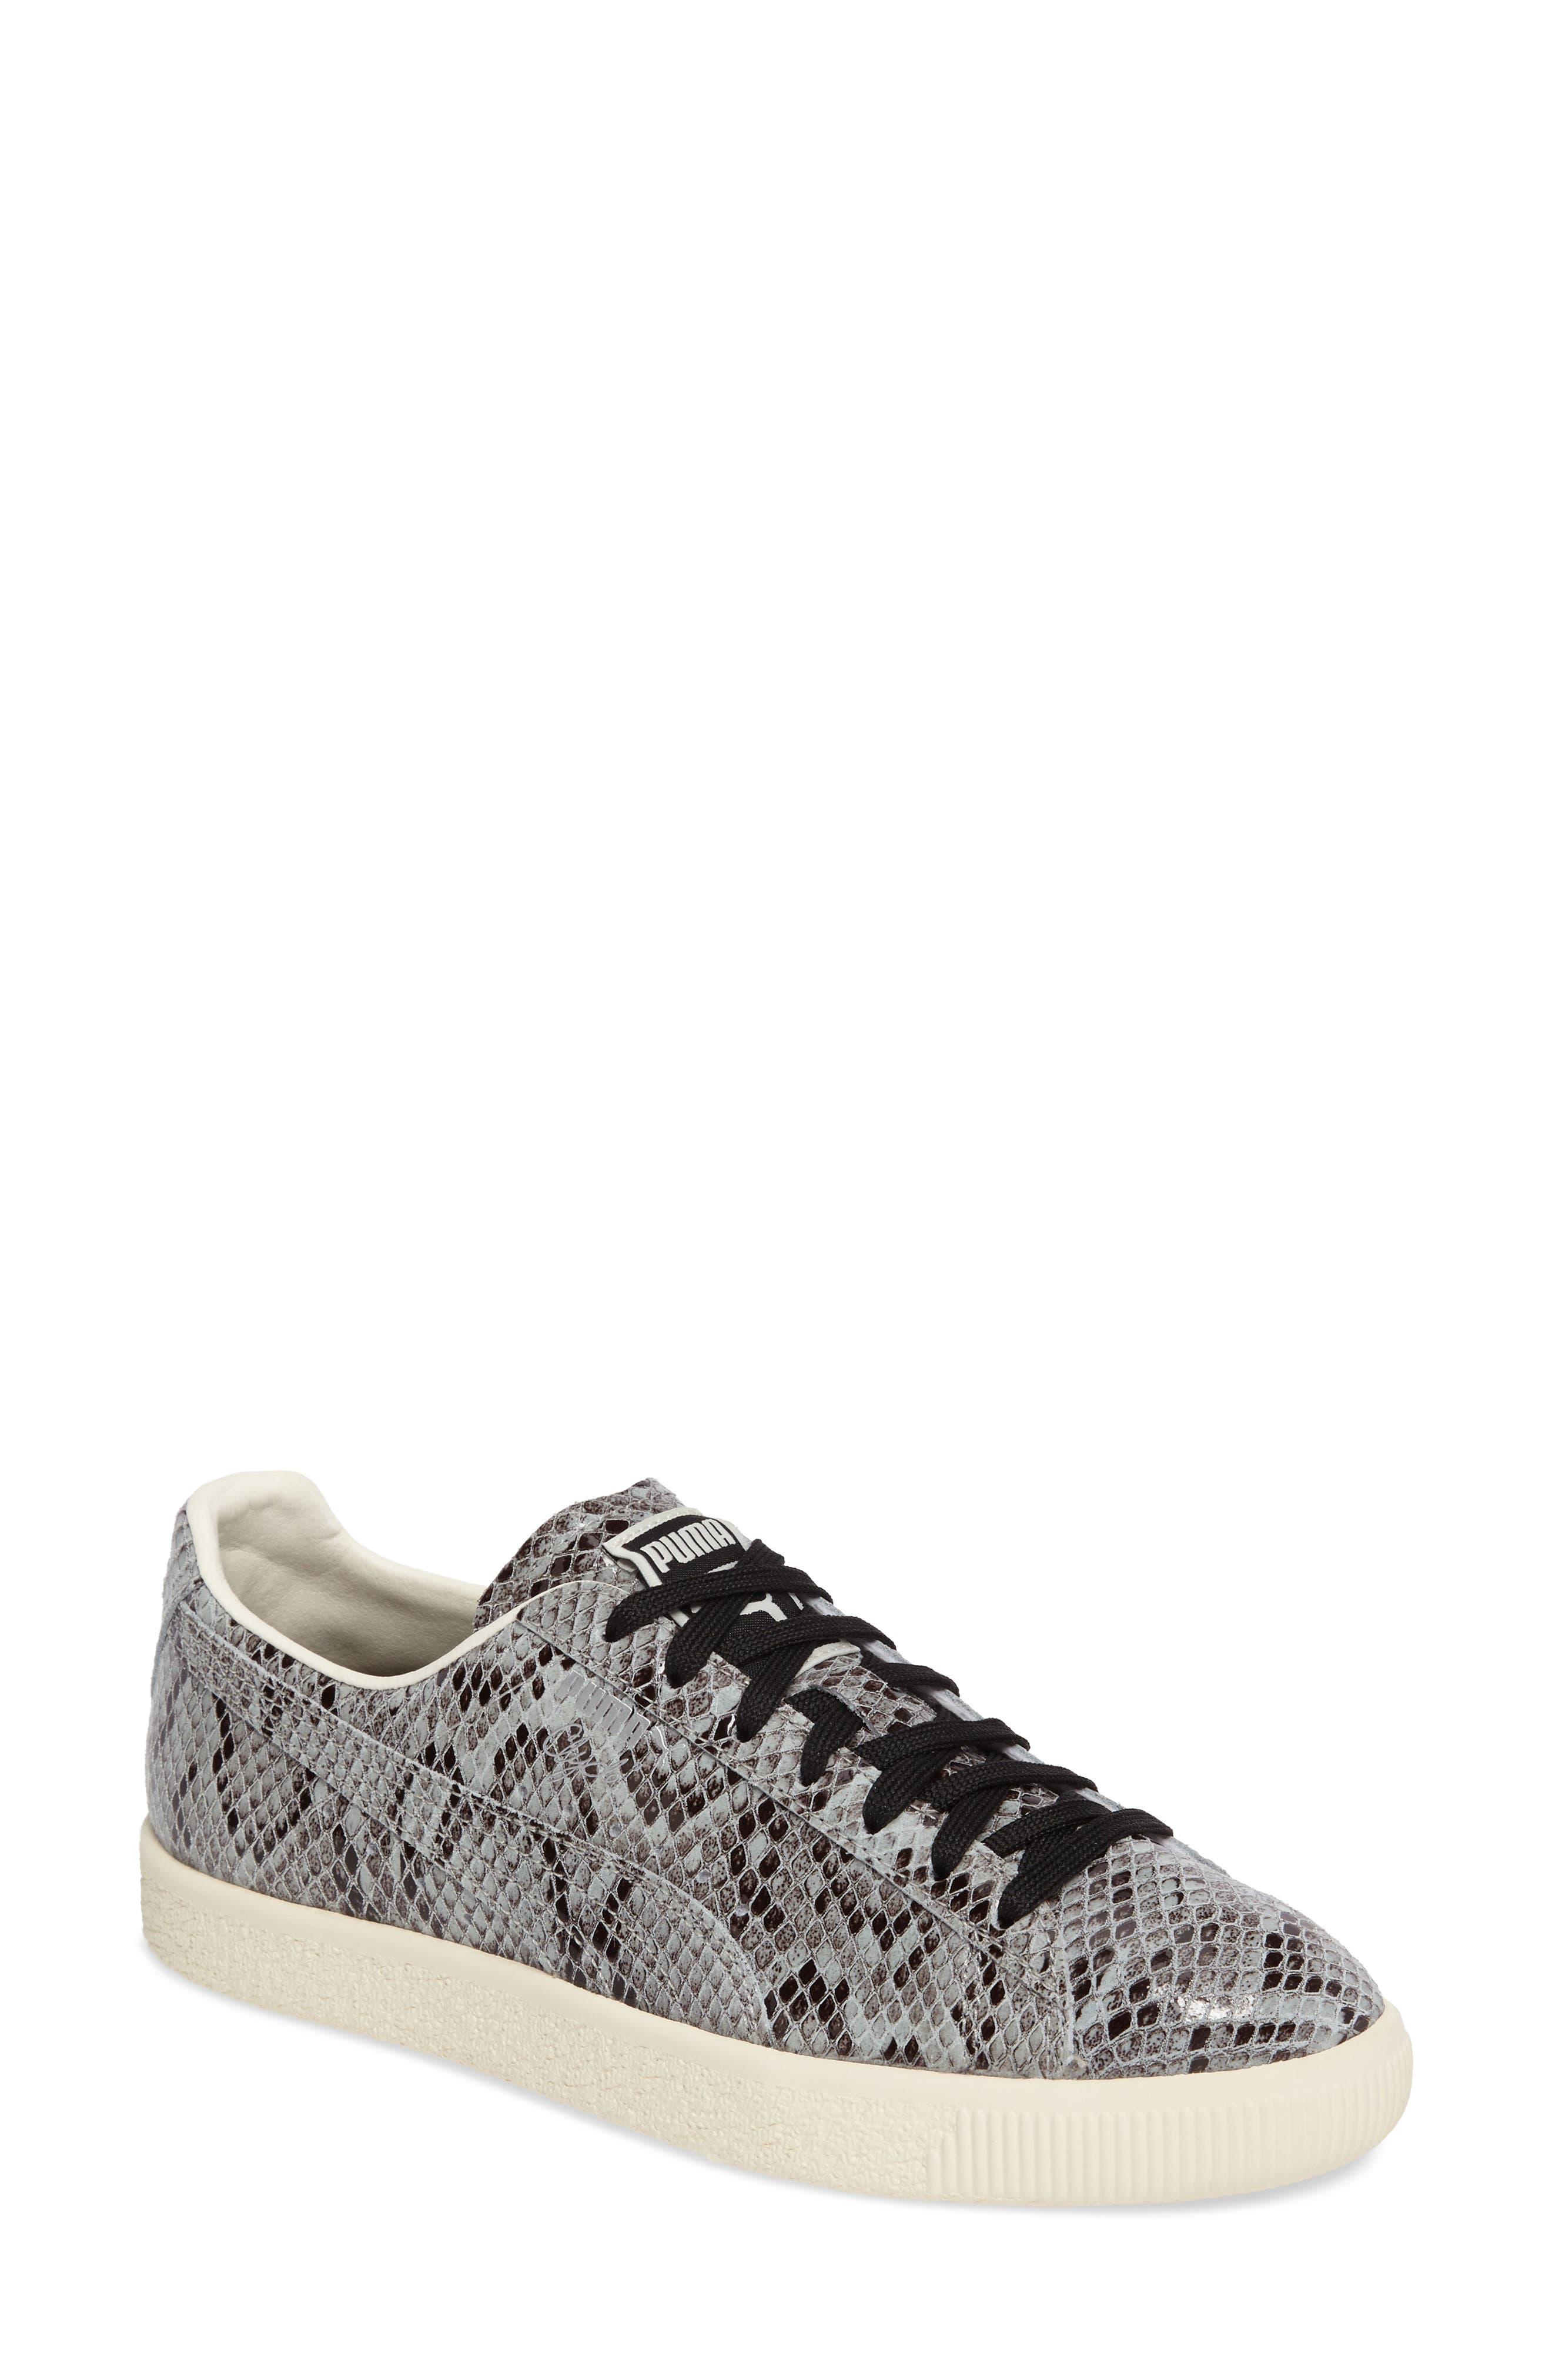 Clyde Sneaker,                         Main,                         color, Puma Silver